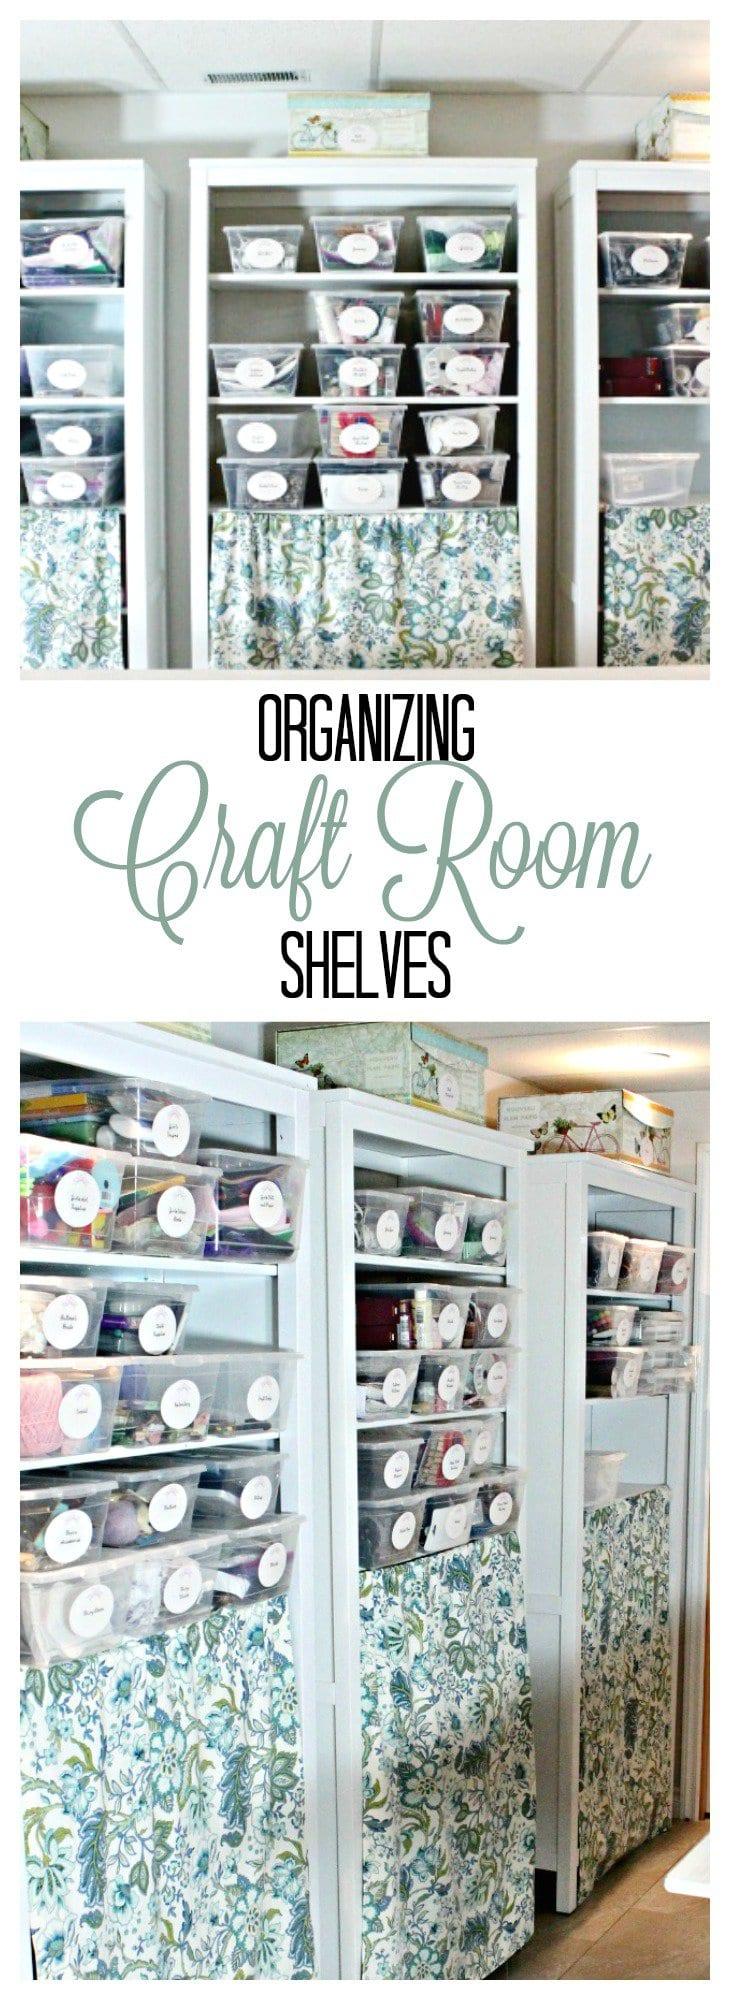 organizing crafts, organizing craft room shelves, craft room organization ideas